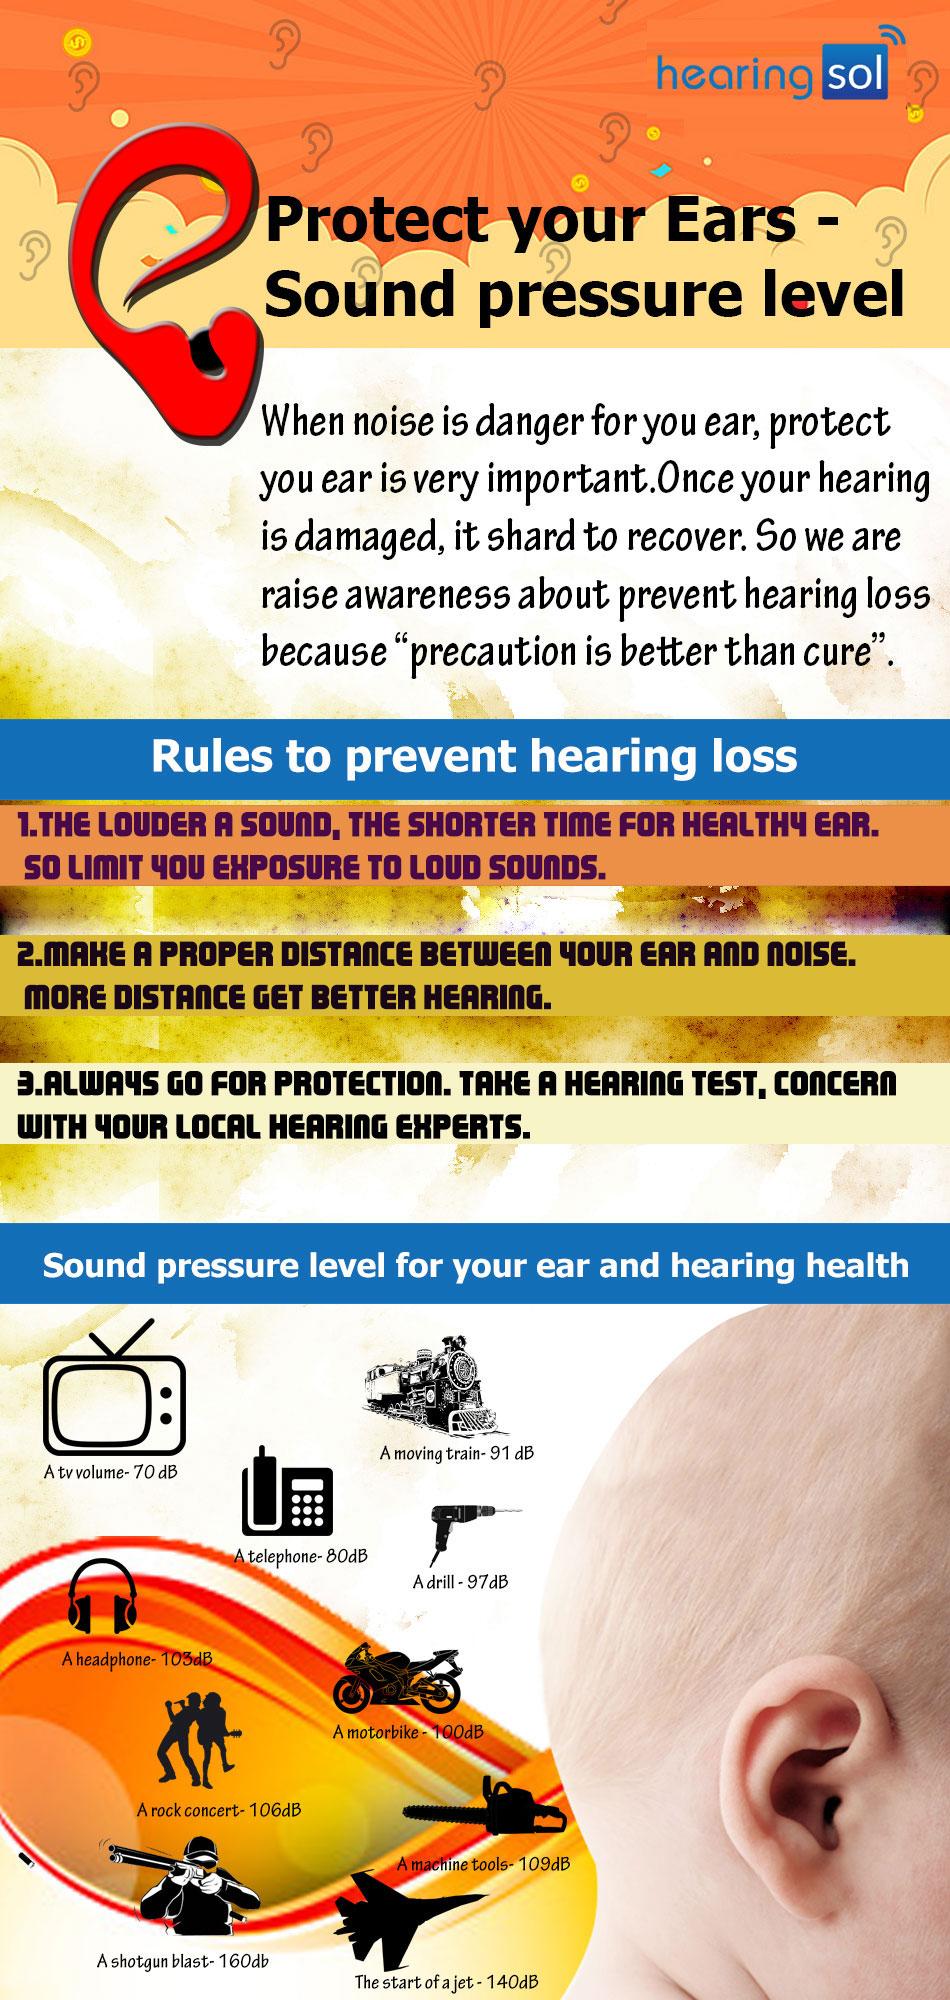 sound pressure levels